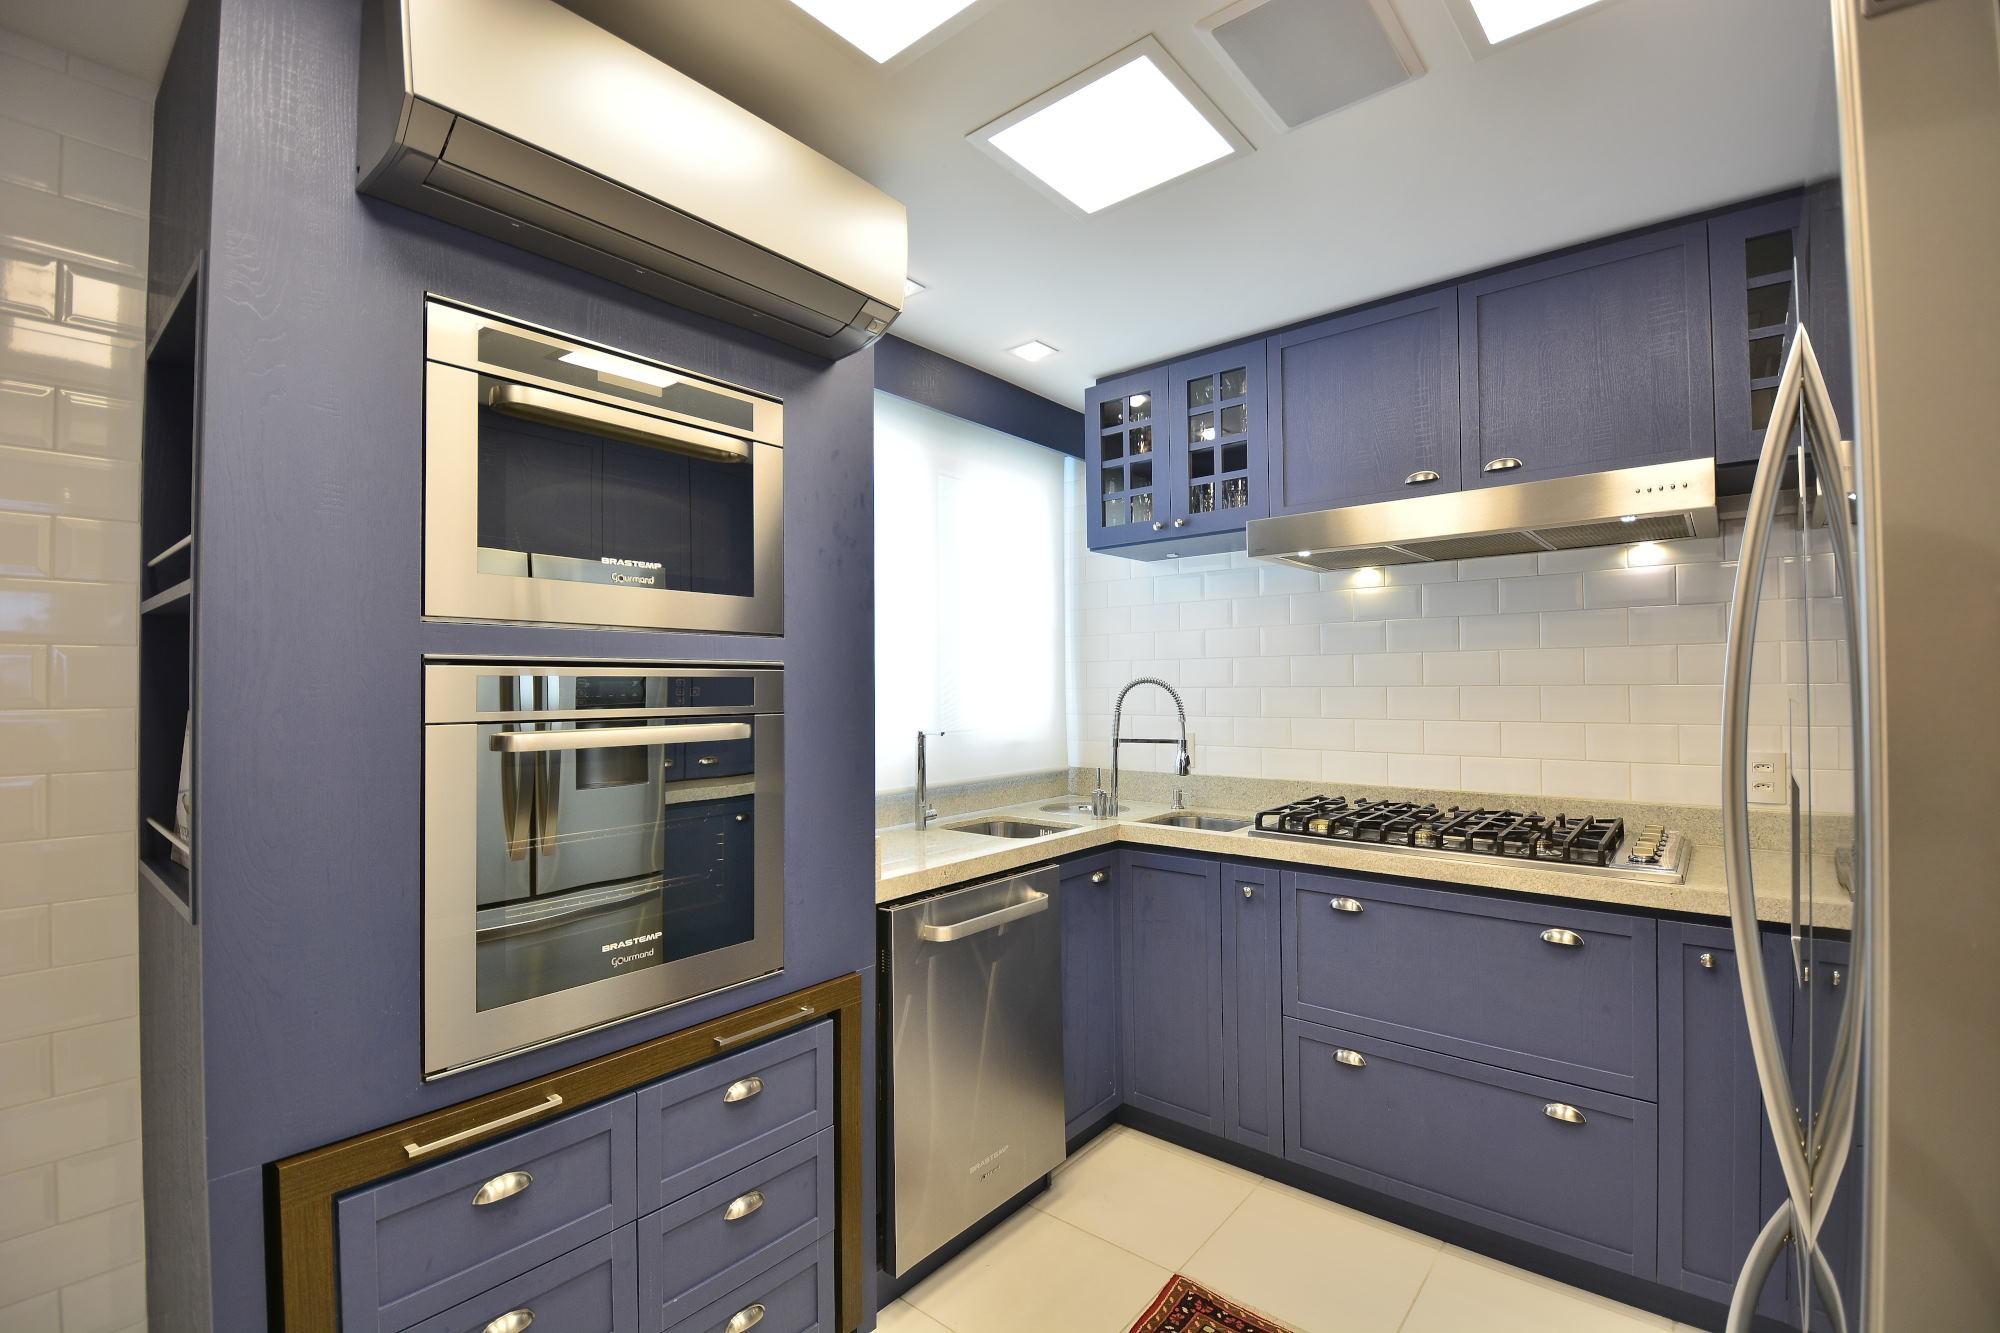 Cozinha MP-CAROLINE ANDREOLLI ARQUITETURA